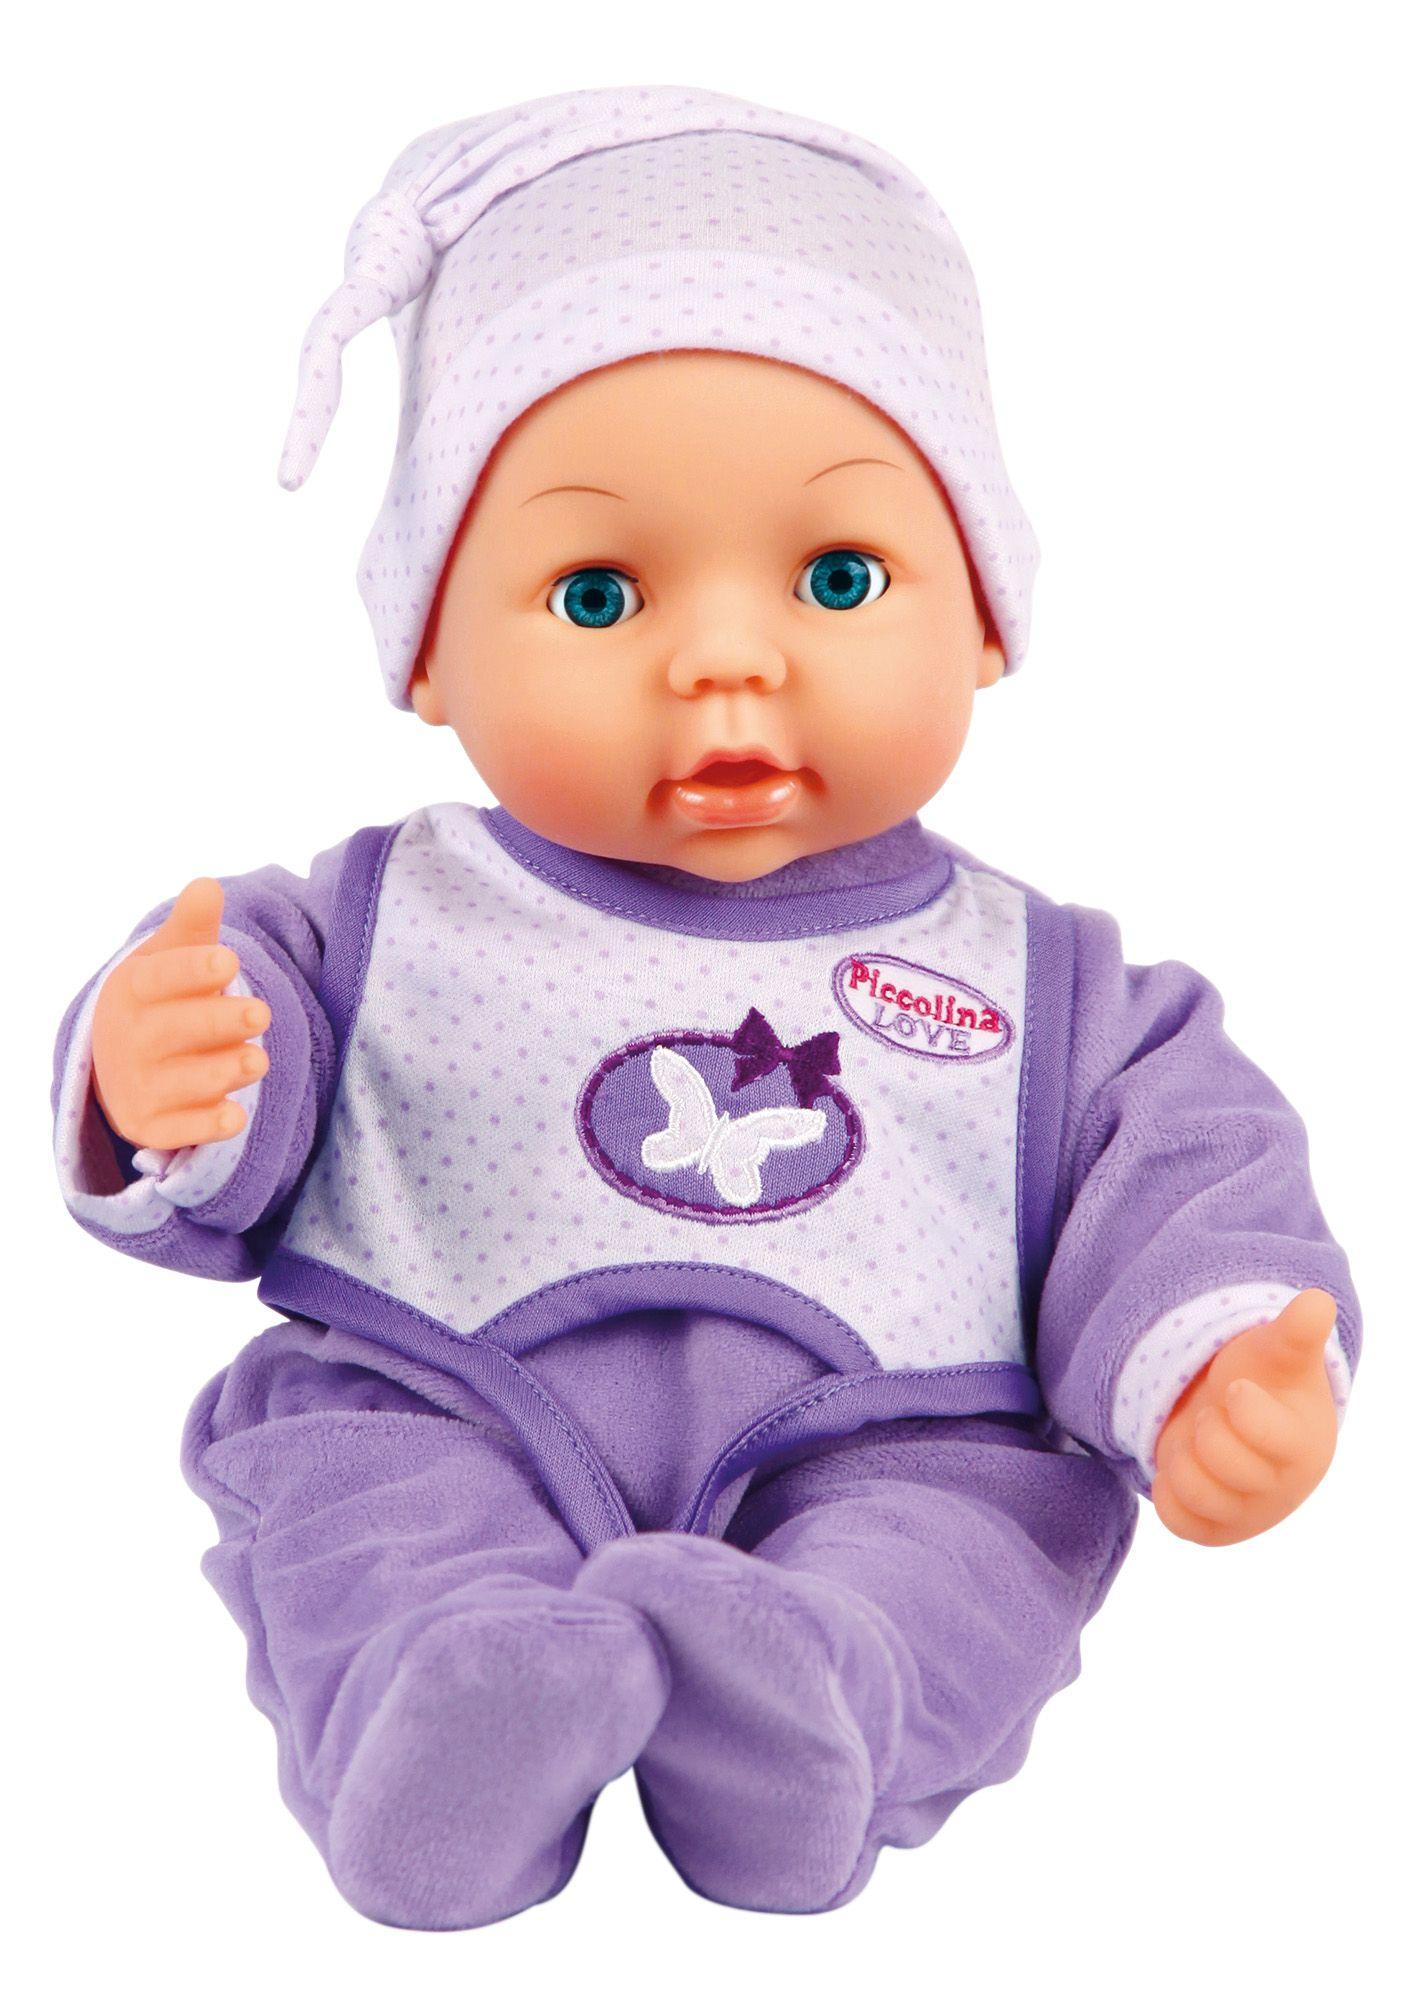 BAYER Bayer Design Babypuppe, »Piccolina Love«